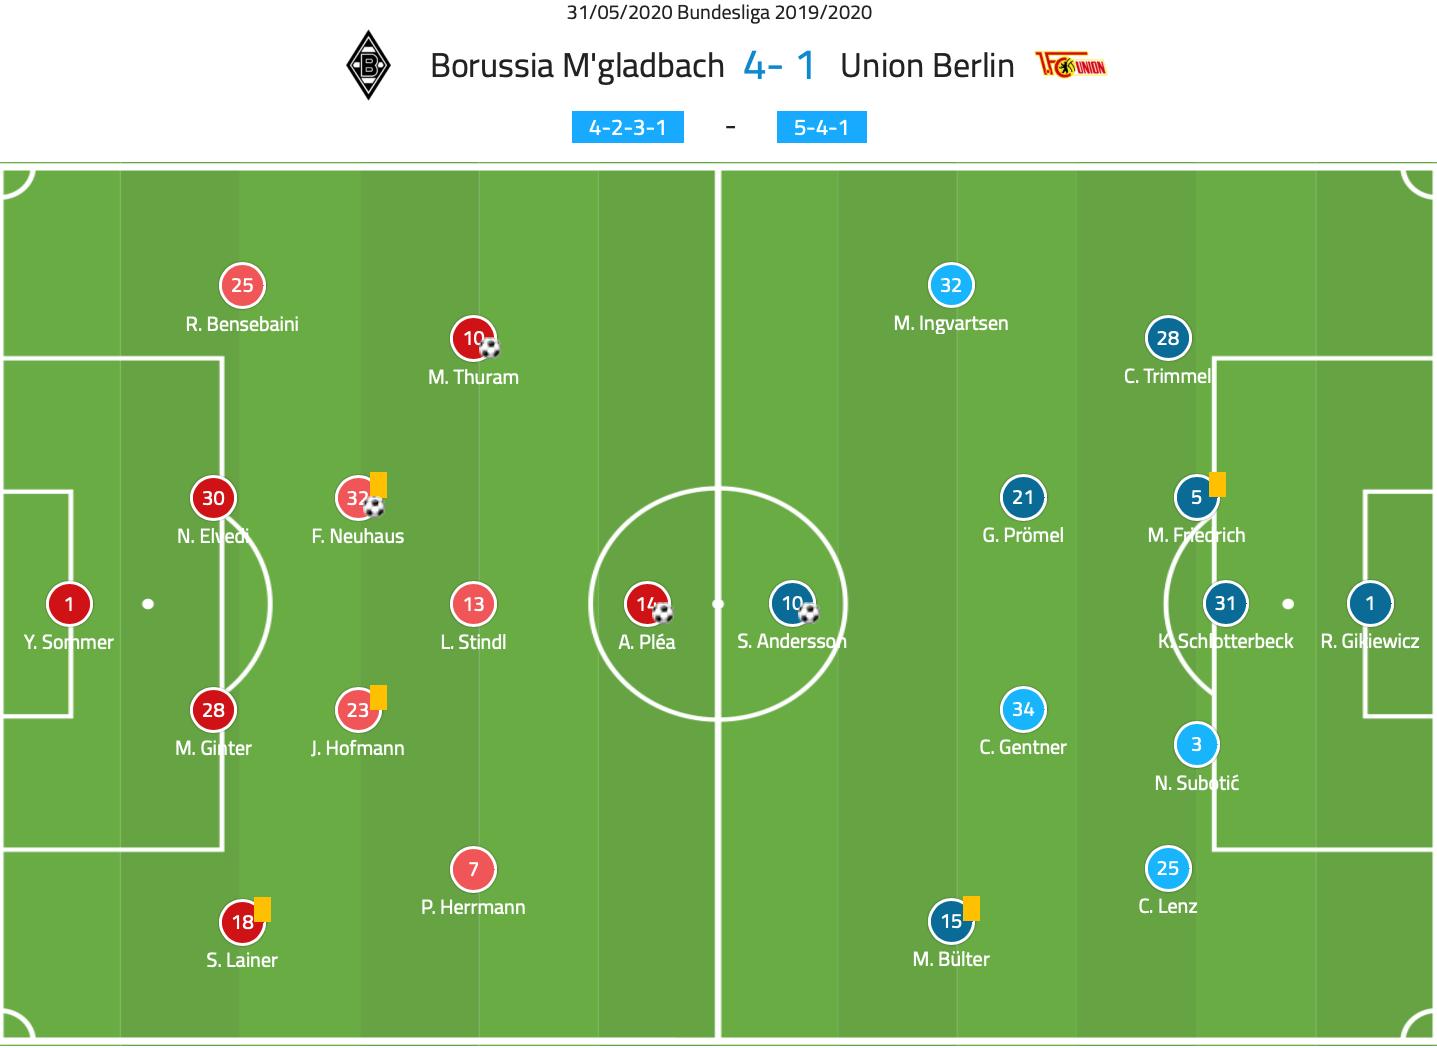 Bundesliga 2019/20: Borussia Monchengladbach vs Union Berlin – tactical analysis tactics